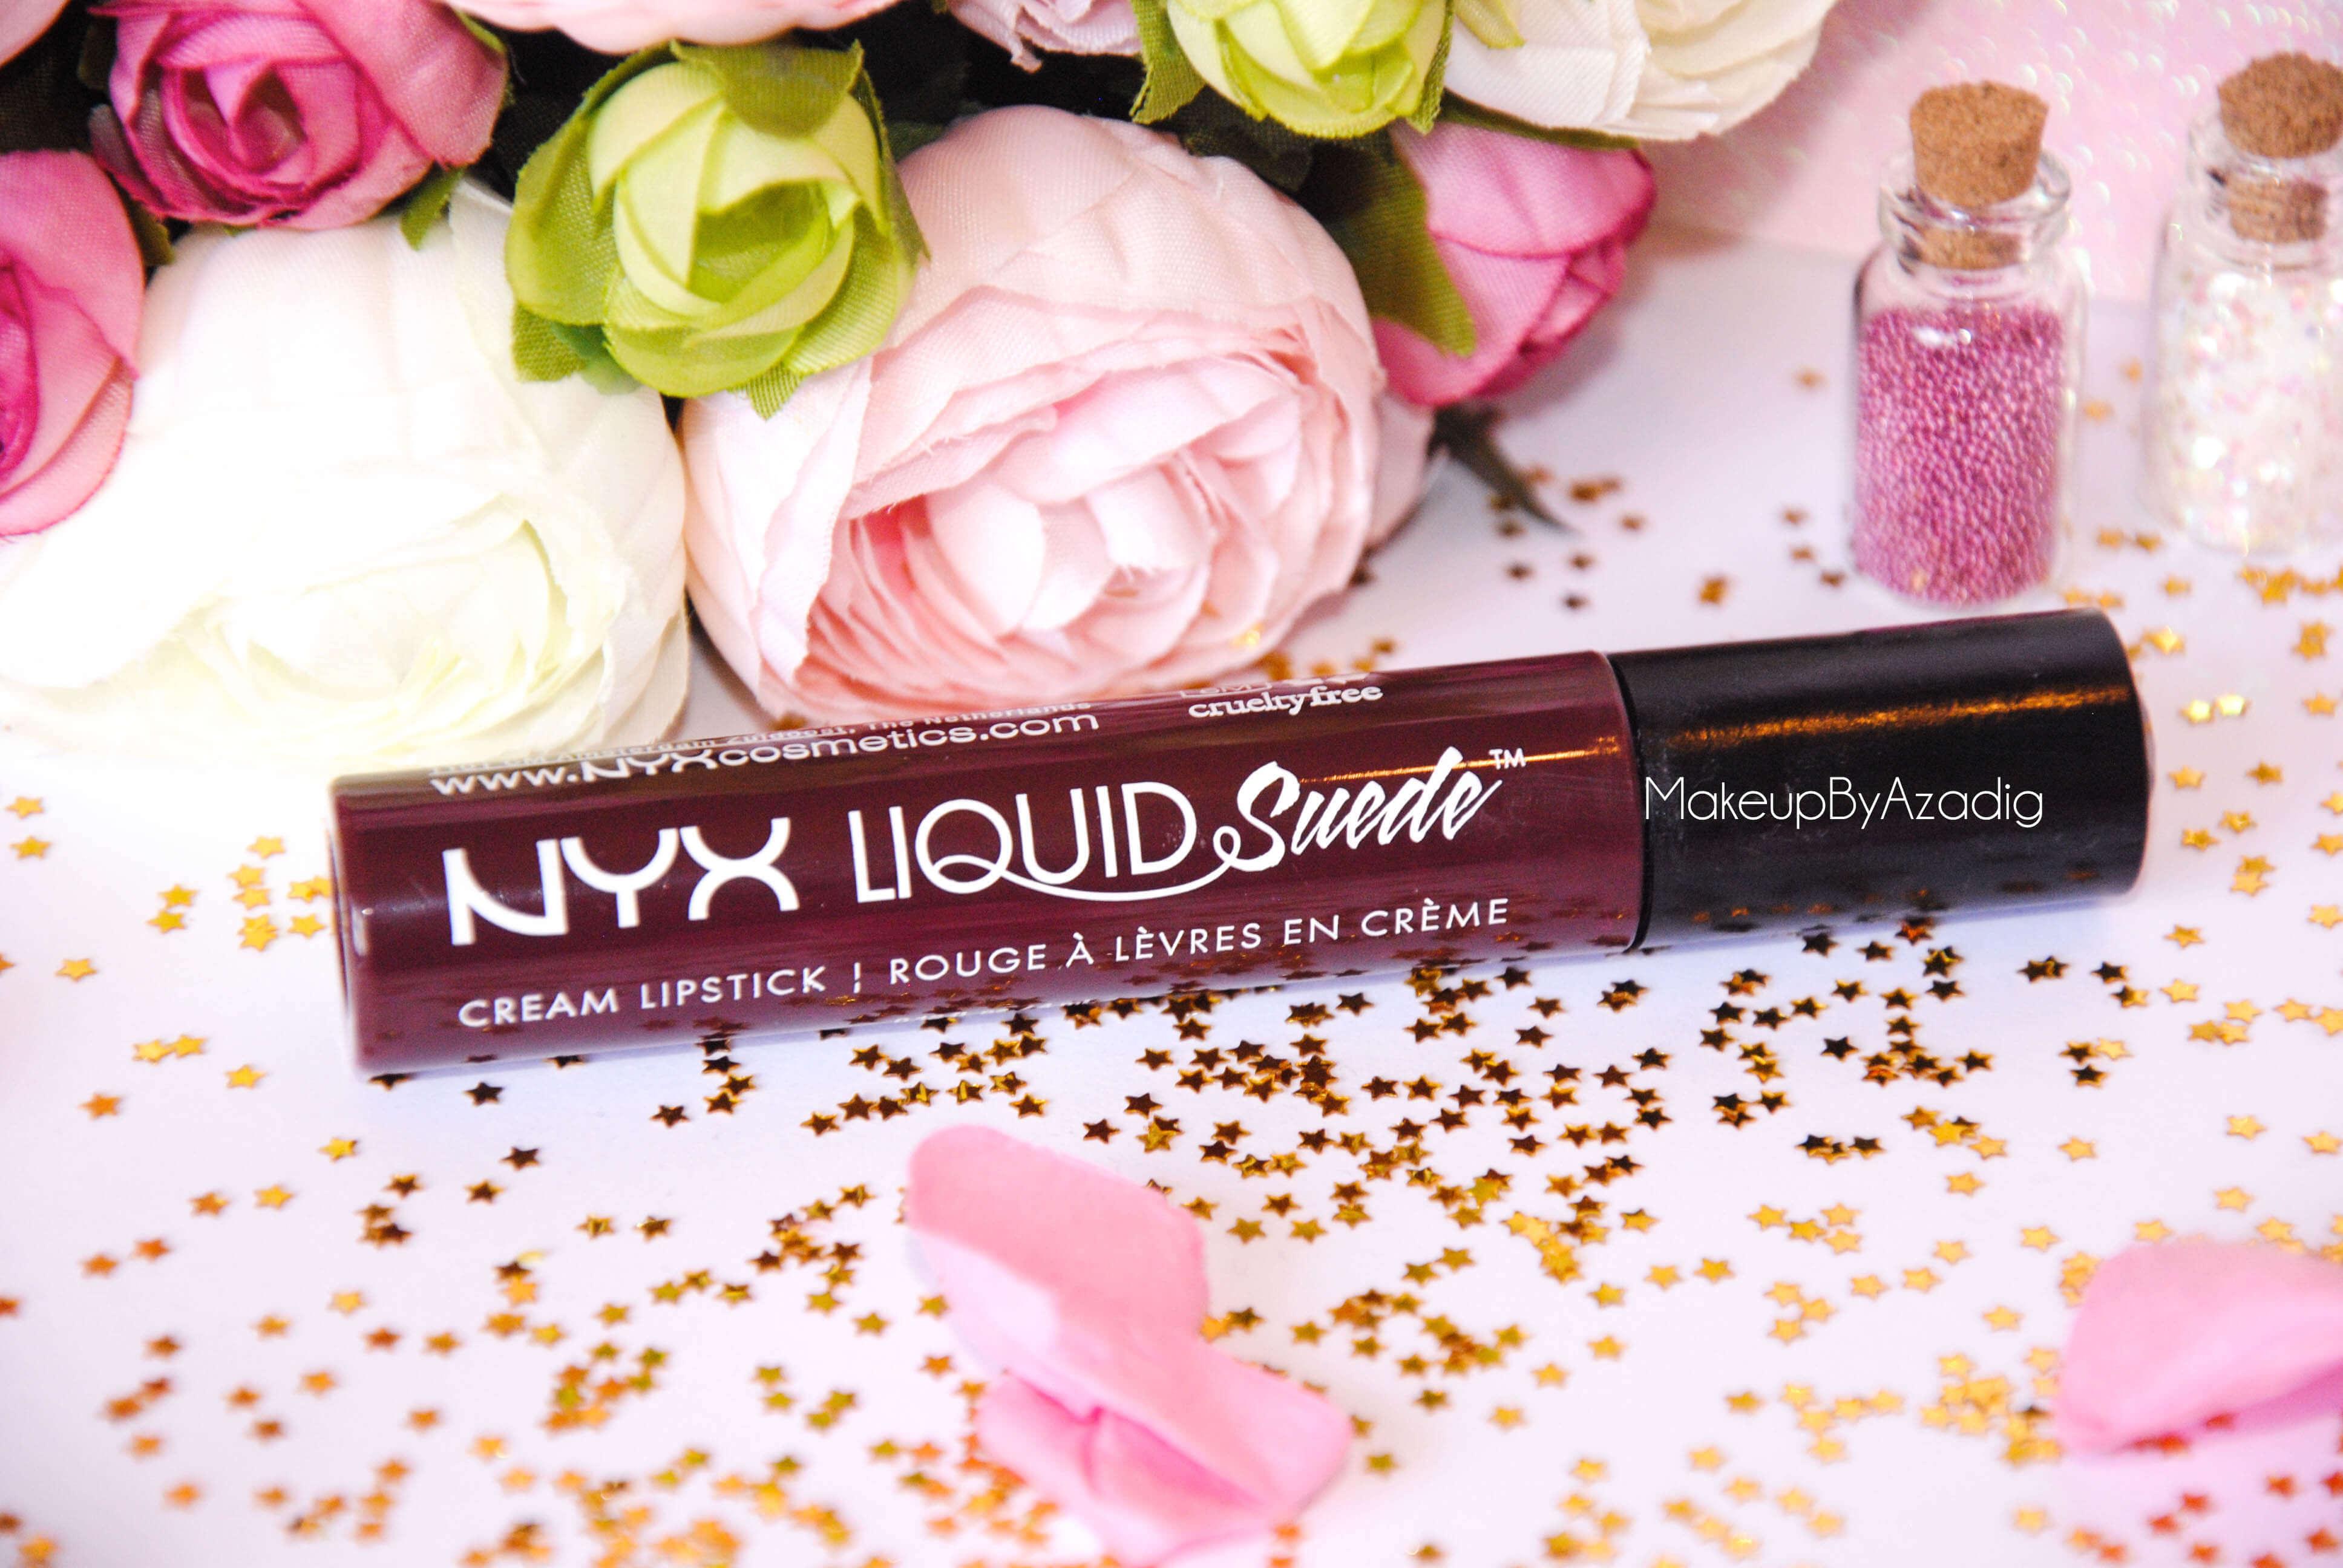 liquid suede-makeupbyazadig-swatch-nyx-cosmetics-pink lust-sway-stone fox-soft spoken-orange cunty-sandstorm-amethyst-lipstick-sway-cherry skies-vintage-12